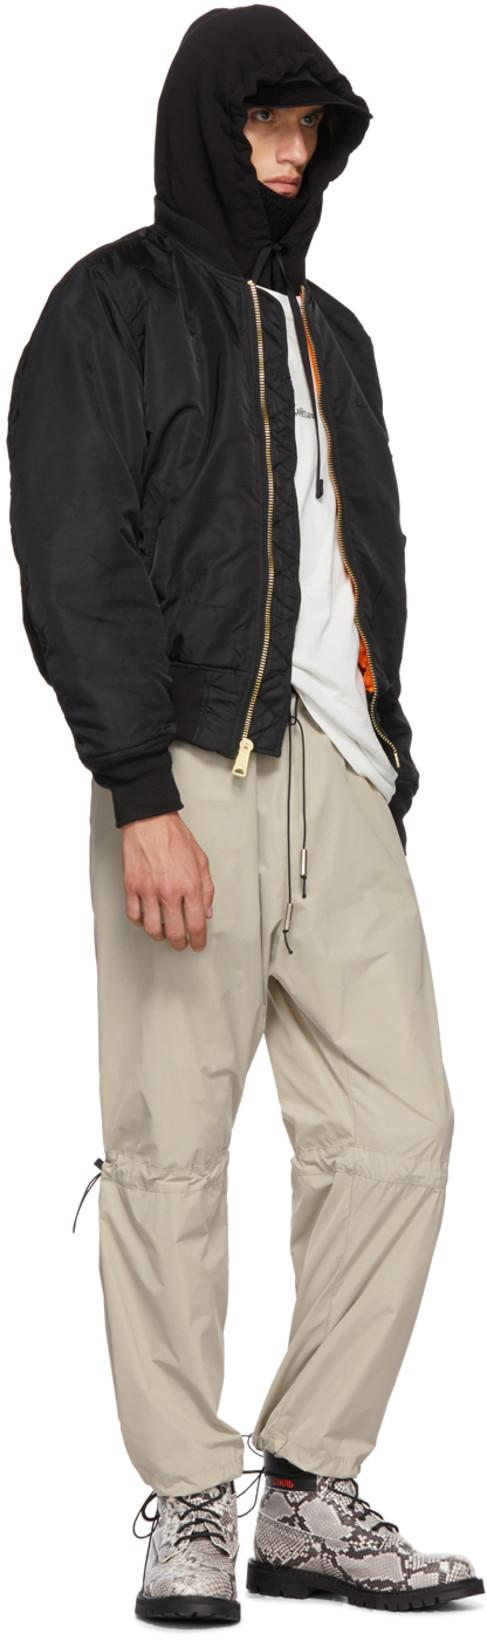 From Ssense S Closet Alyx Heronpreston Bomber Jacket Heron Preston Fashion Store [ 1640 x 487 Pixel ]